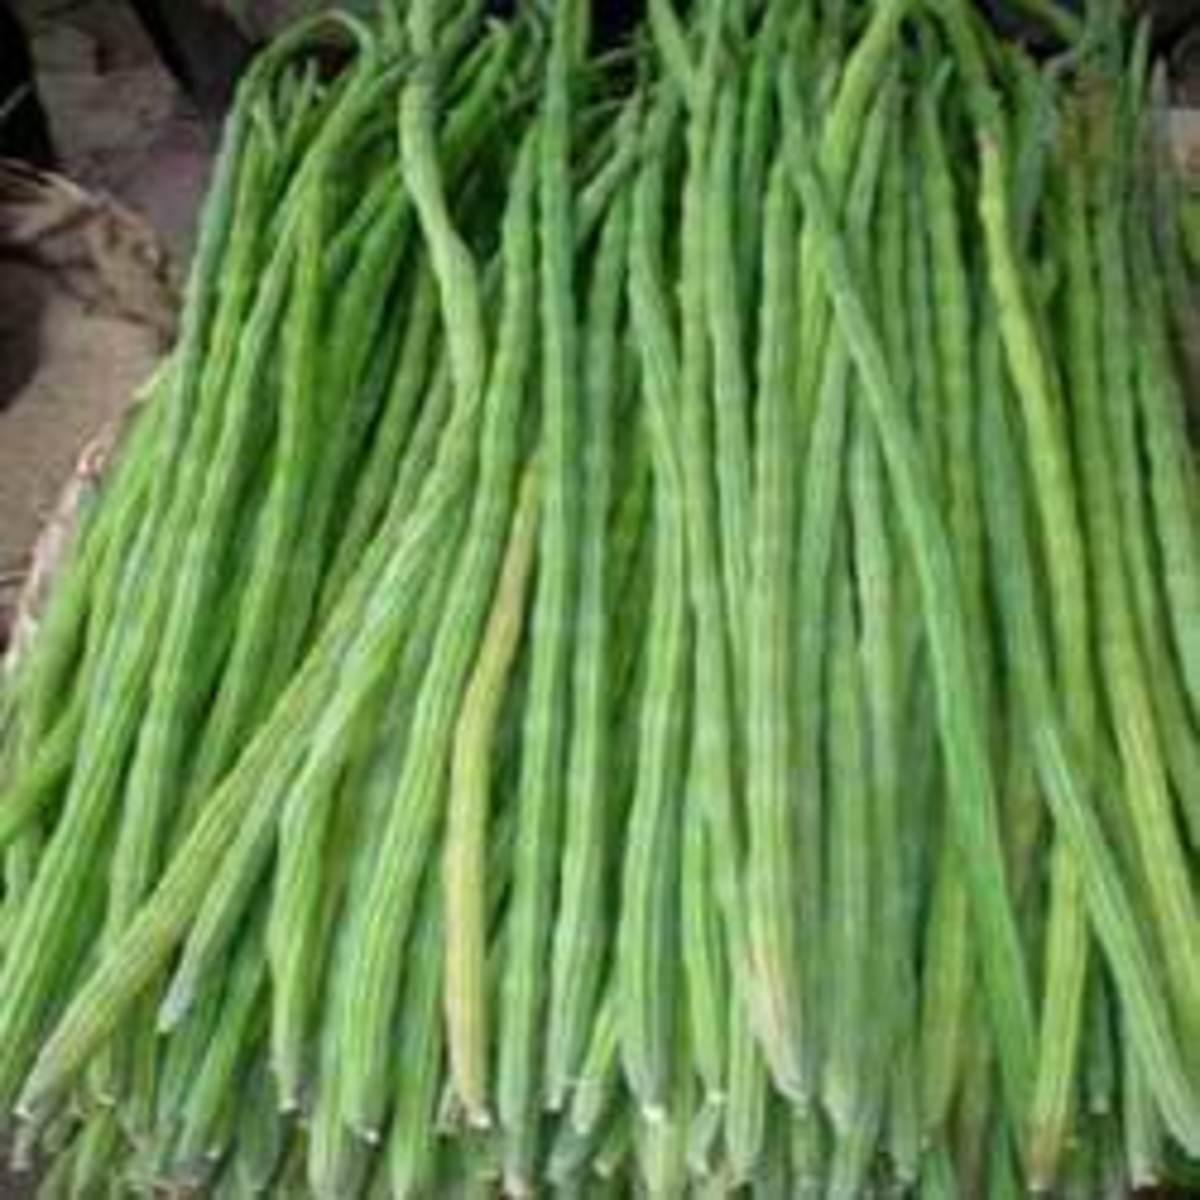 Drum stick vegetable